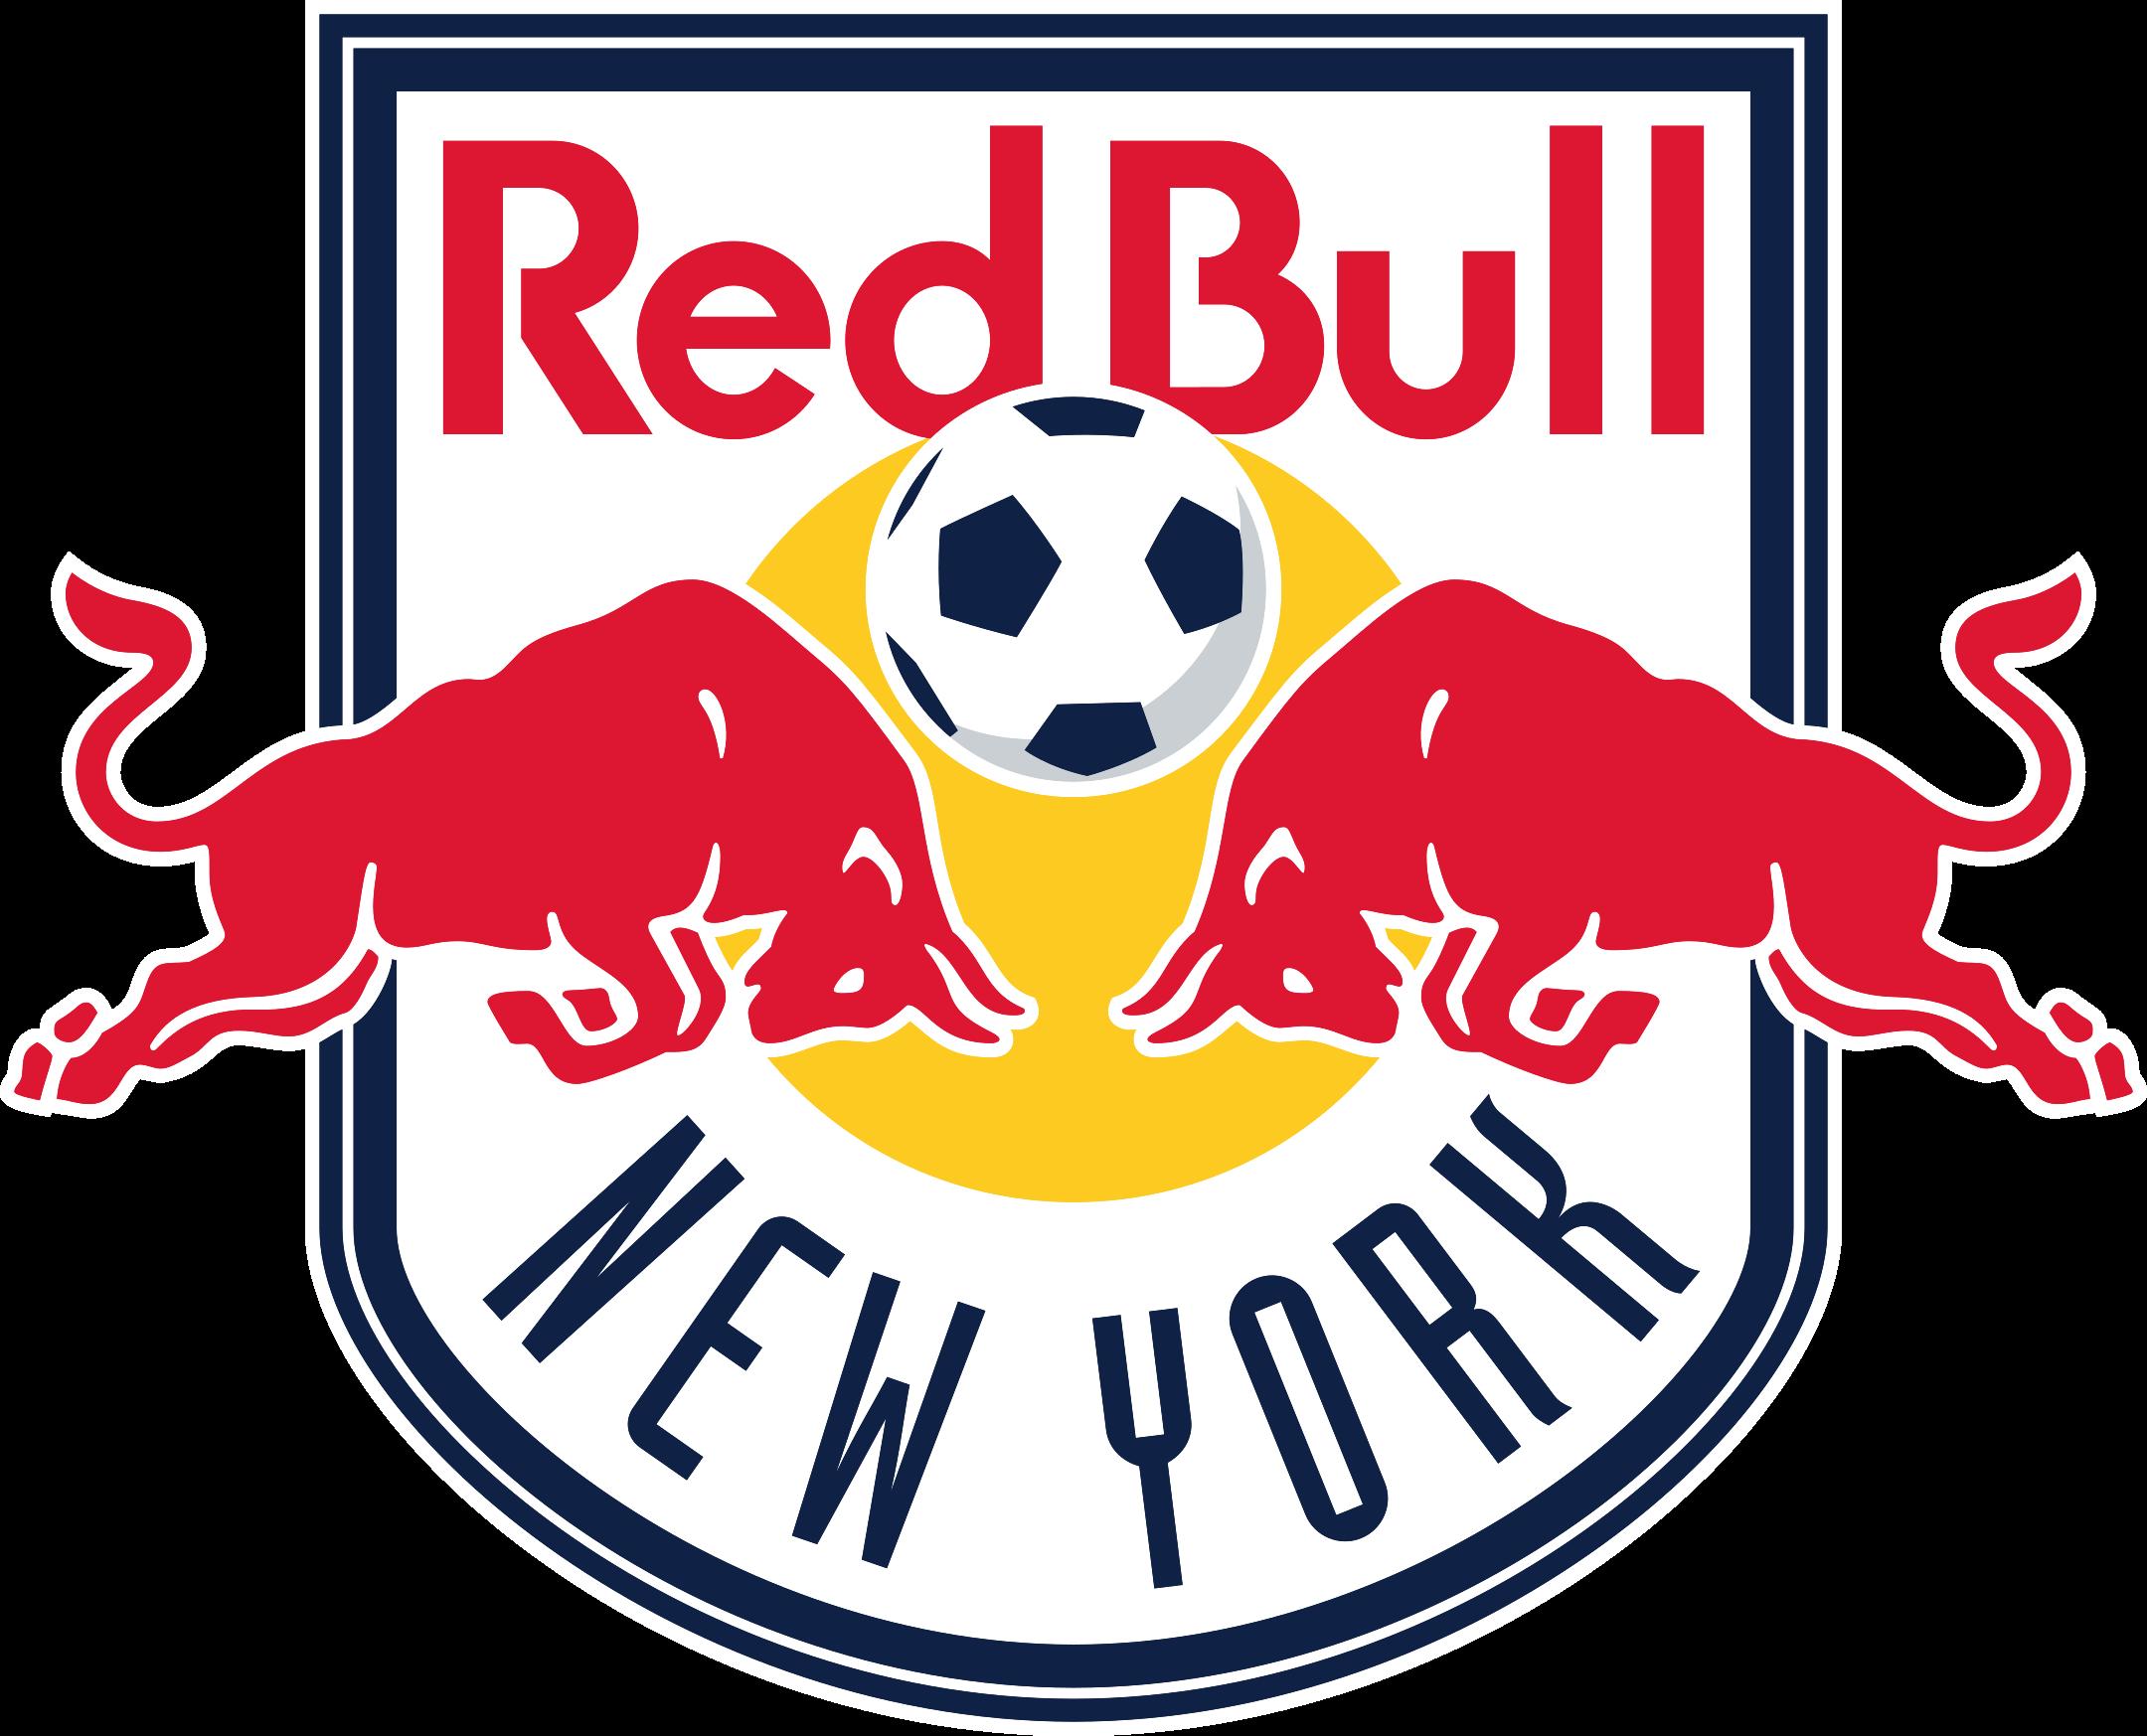 new york red bulls logo 1 - New York Red Bulls Logo